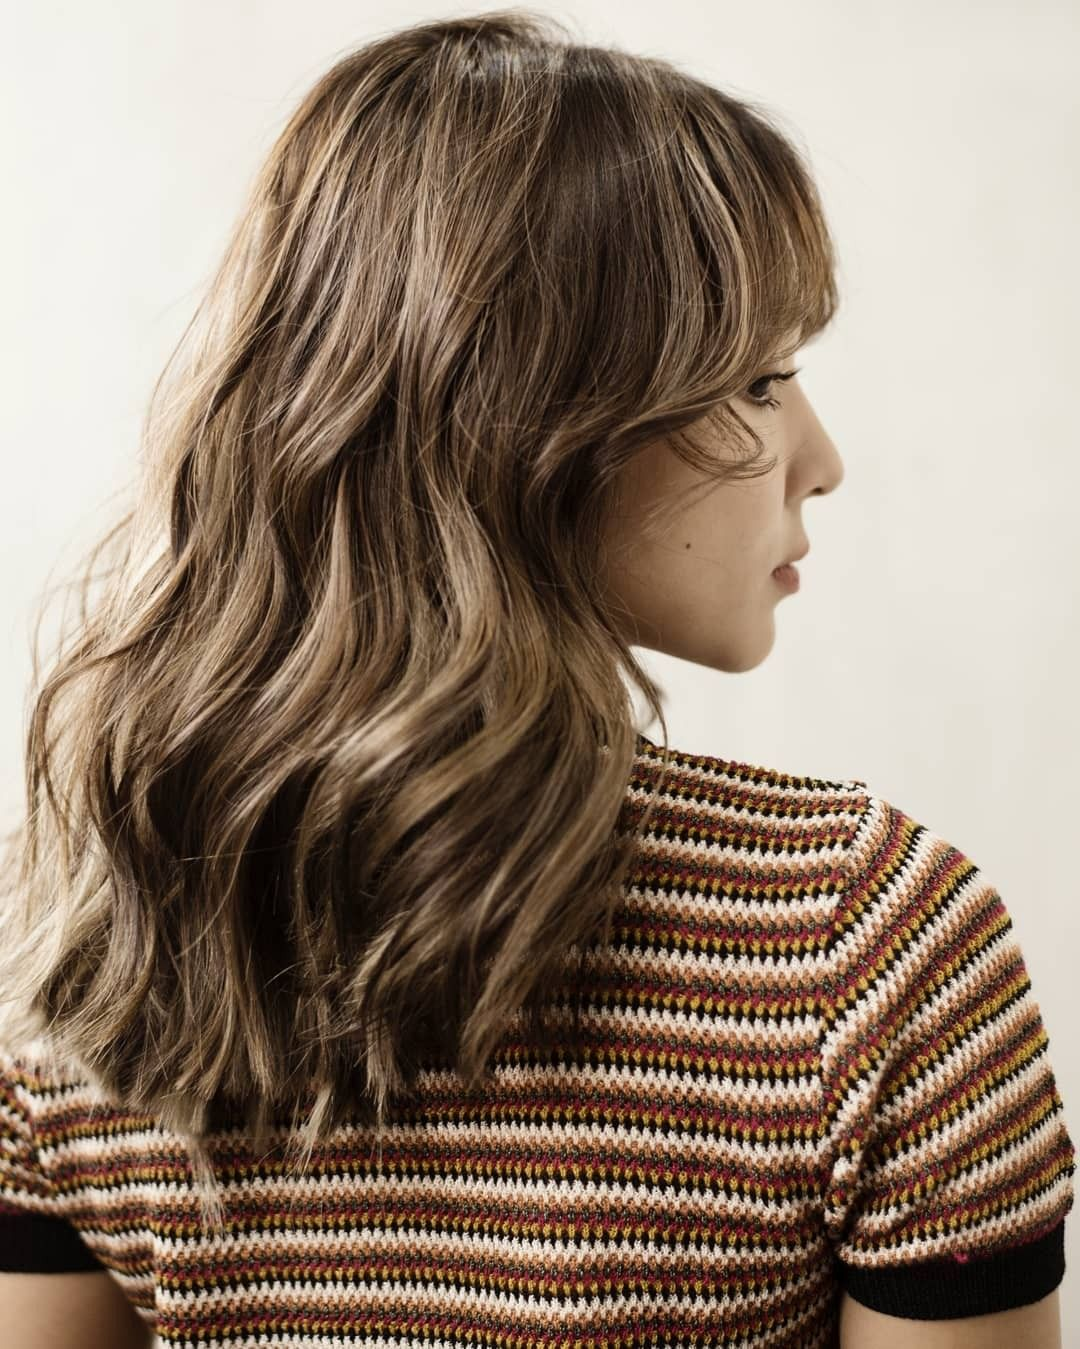 Kathryn Bernardo Daniel Padilla Kathniel 2018 C Kathryn Bernardo Hairstyle Hair Color For Morena Kathryn Bernardo Outfits